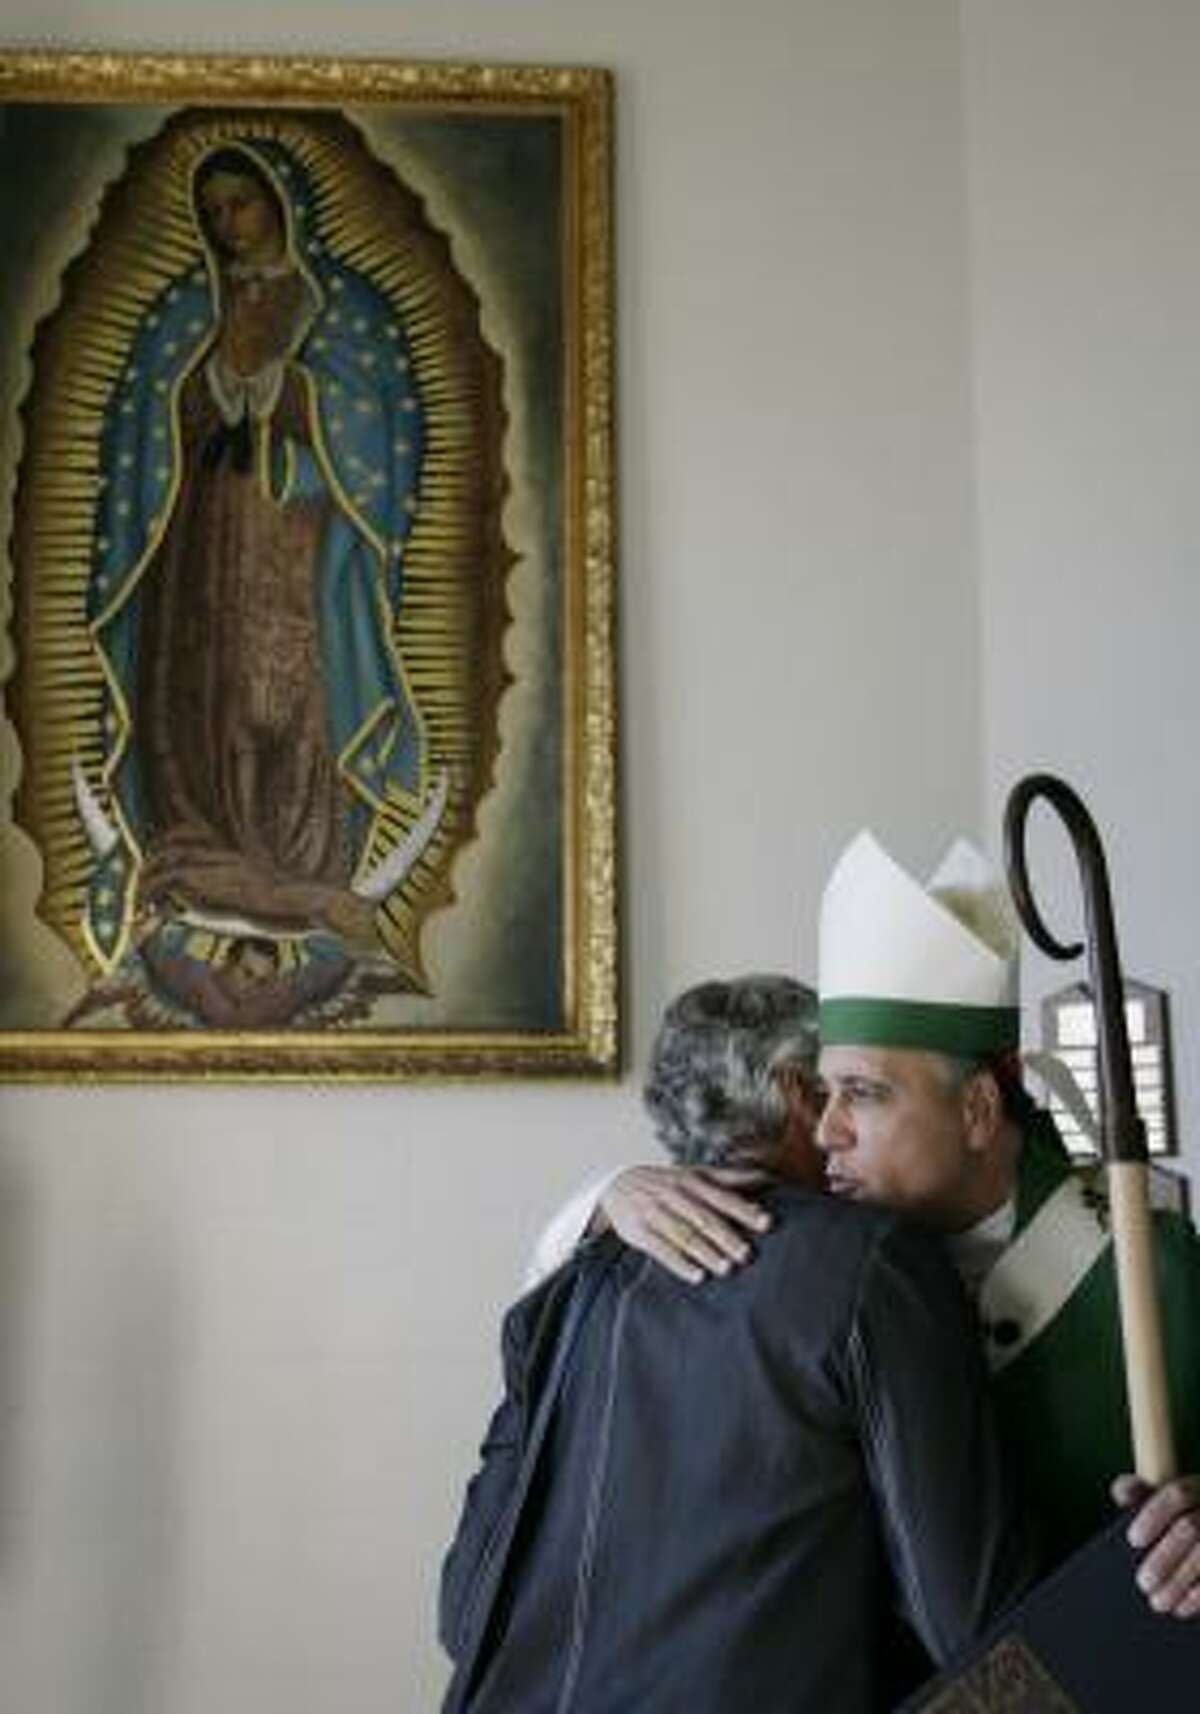 Cardinal Daniel DiNardo embraces a parishioner at St. Patrick Church on Sunday.